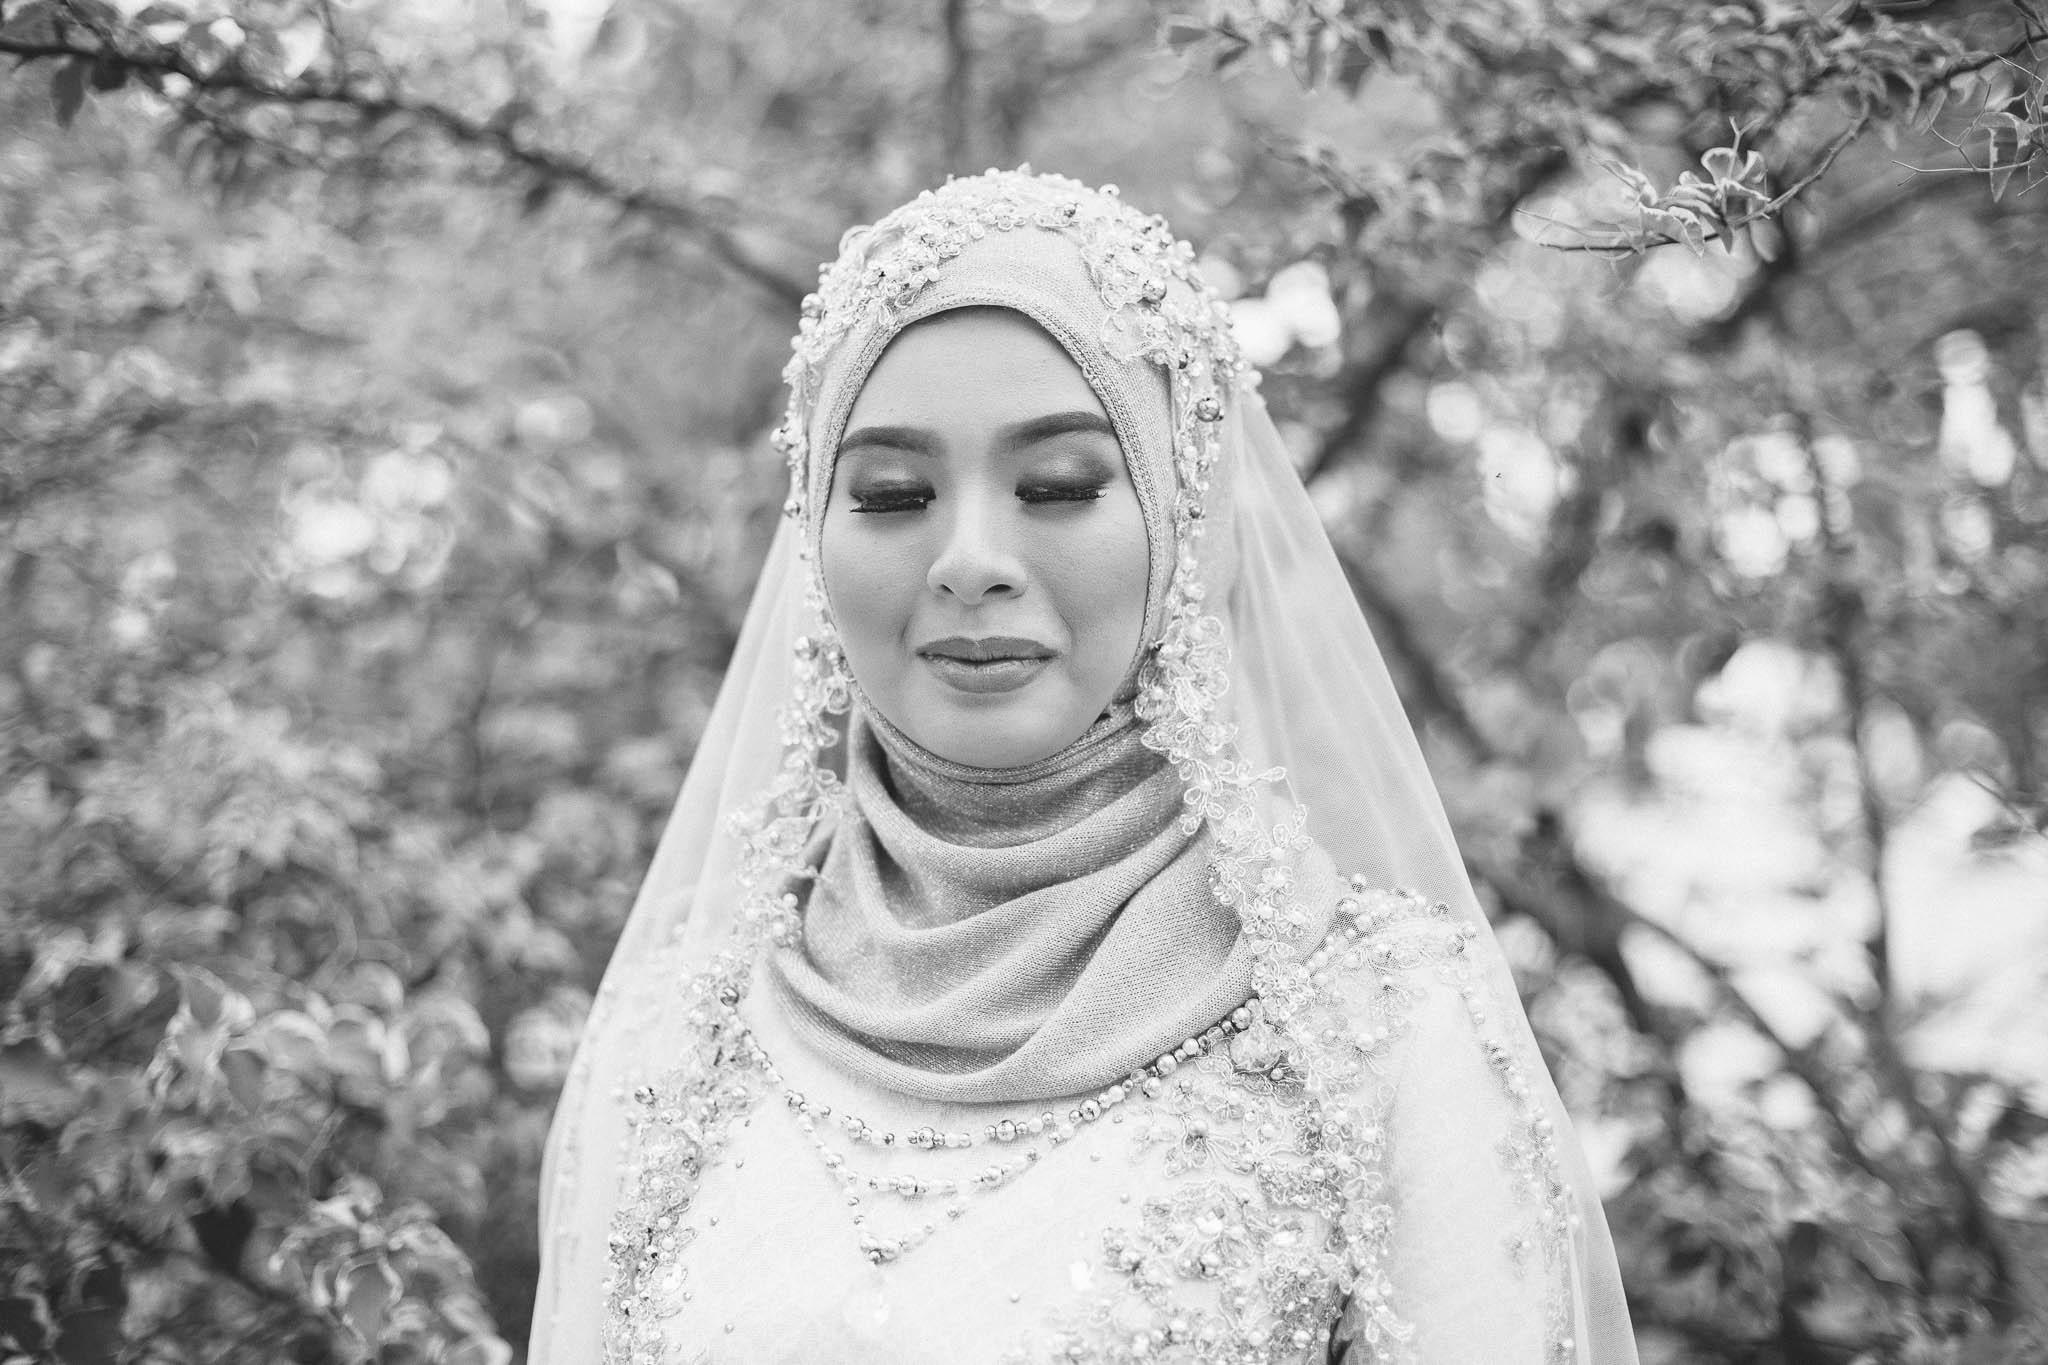 singapore-wedding-photographer-malay-indian-pre-wedding-travel-wmt-2015-59.jpg